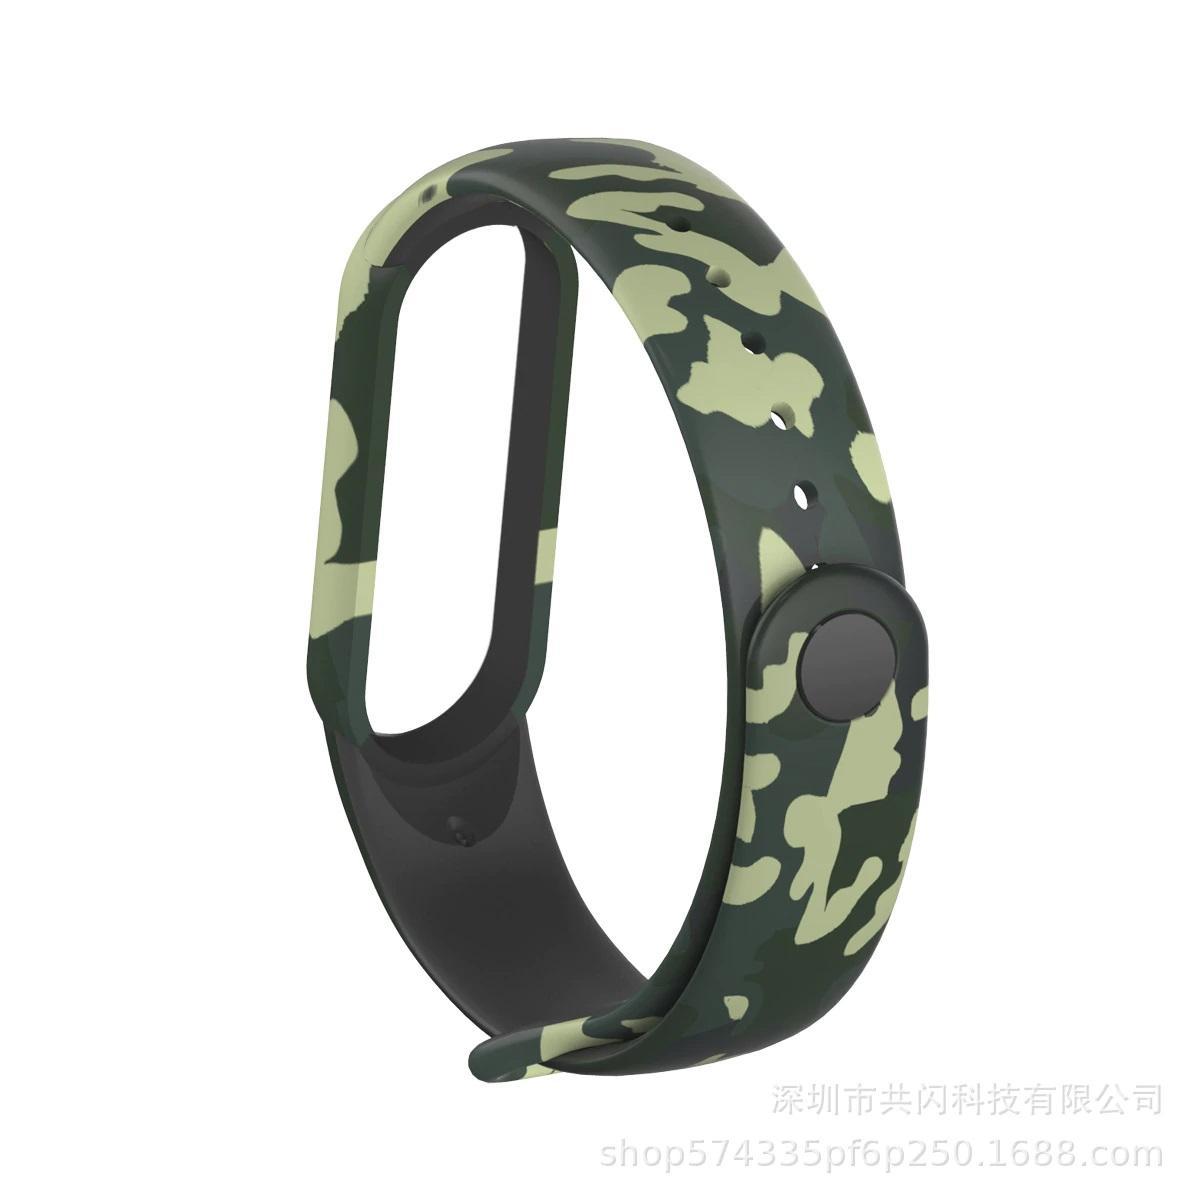 Mi Band 5 Wrist Silicon Strap Art 6 (для Xiaomi Mi Band 5, браслет или ремешок, черн (для Xiaomi Mi